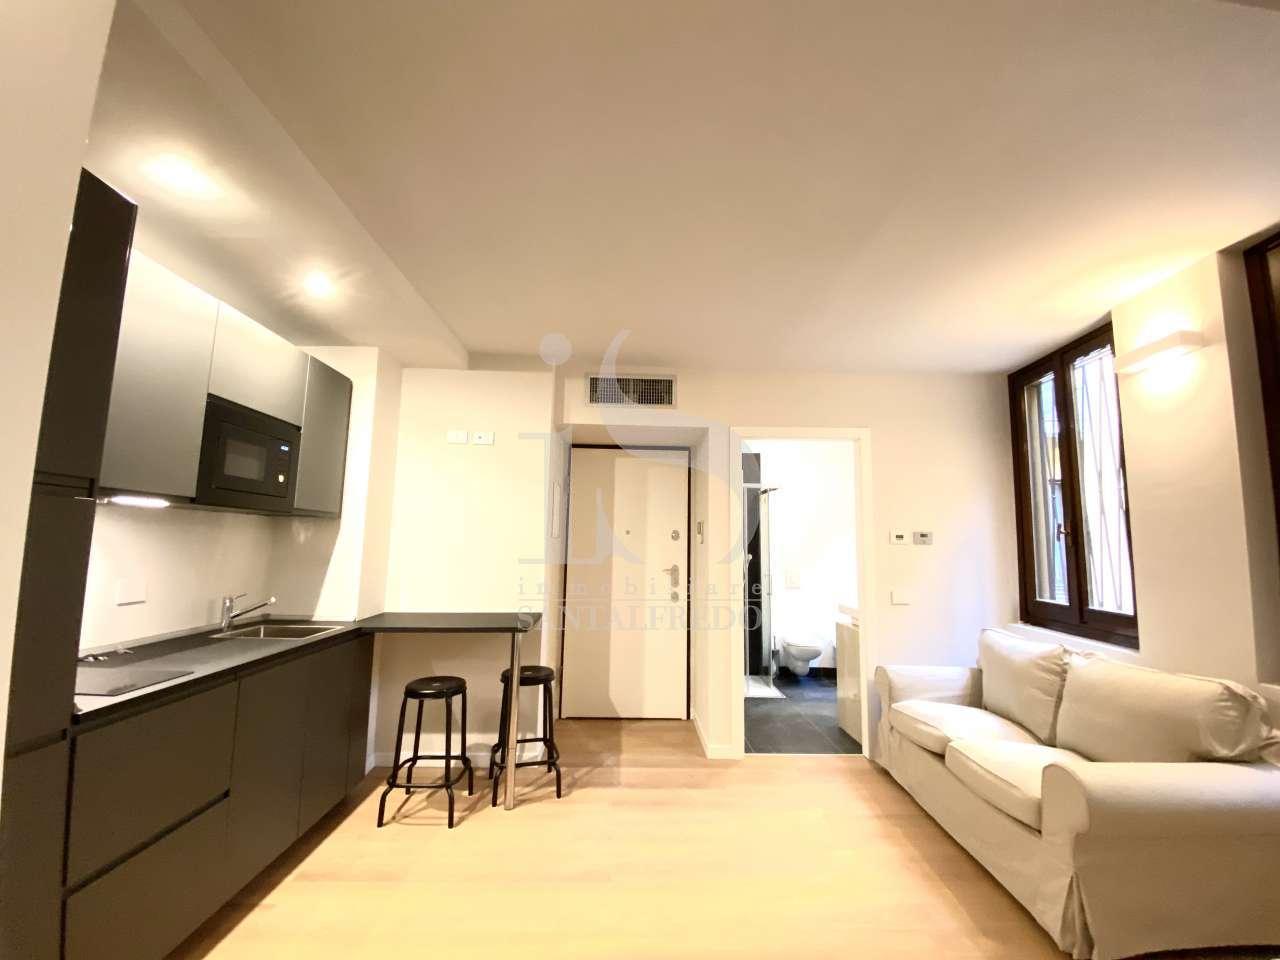 Appartamento MONZA H1 HOME 2016_1